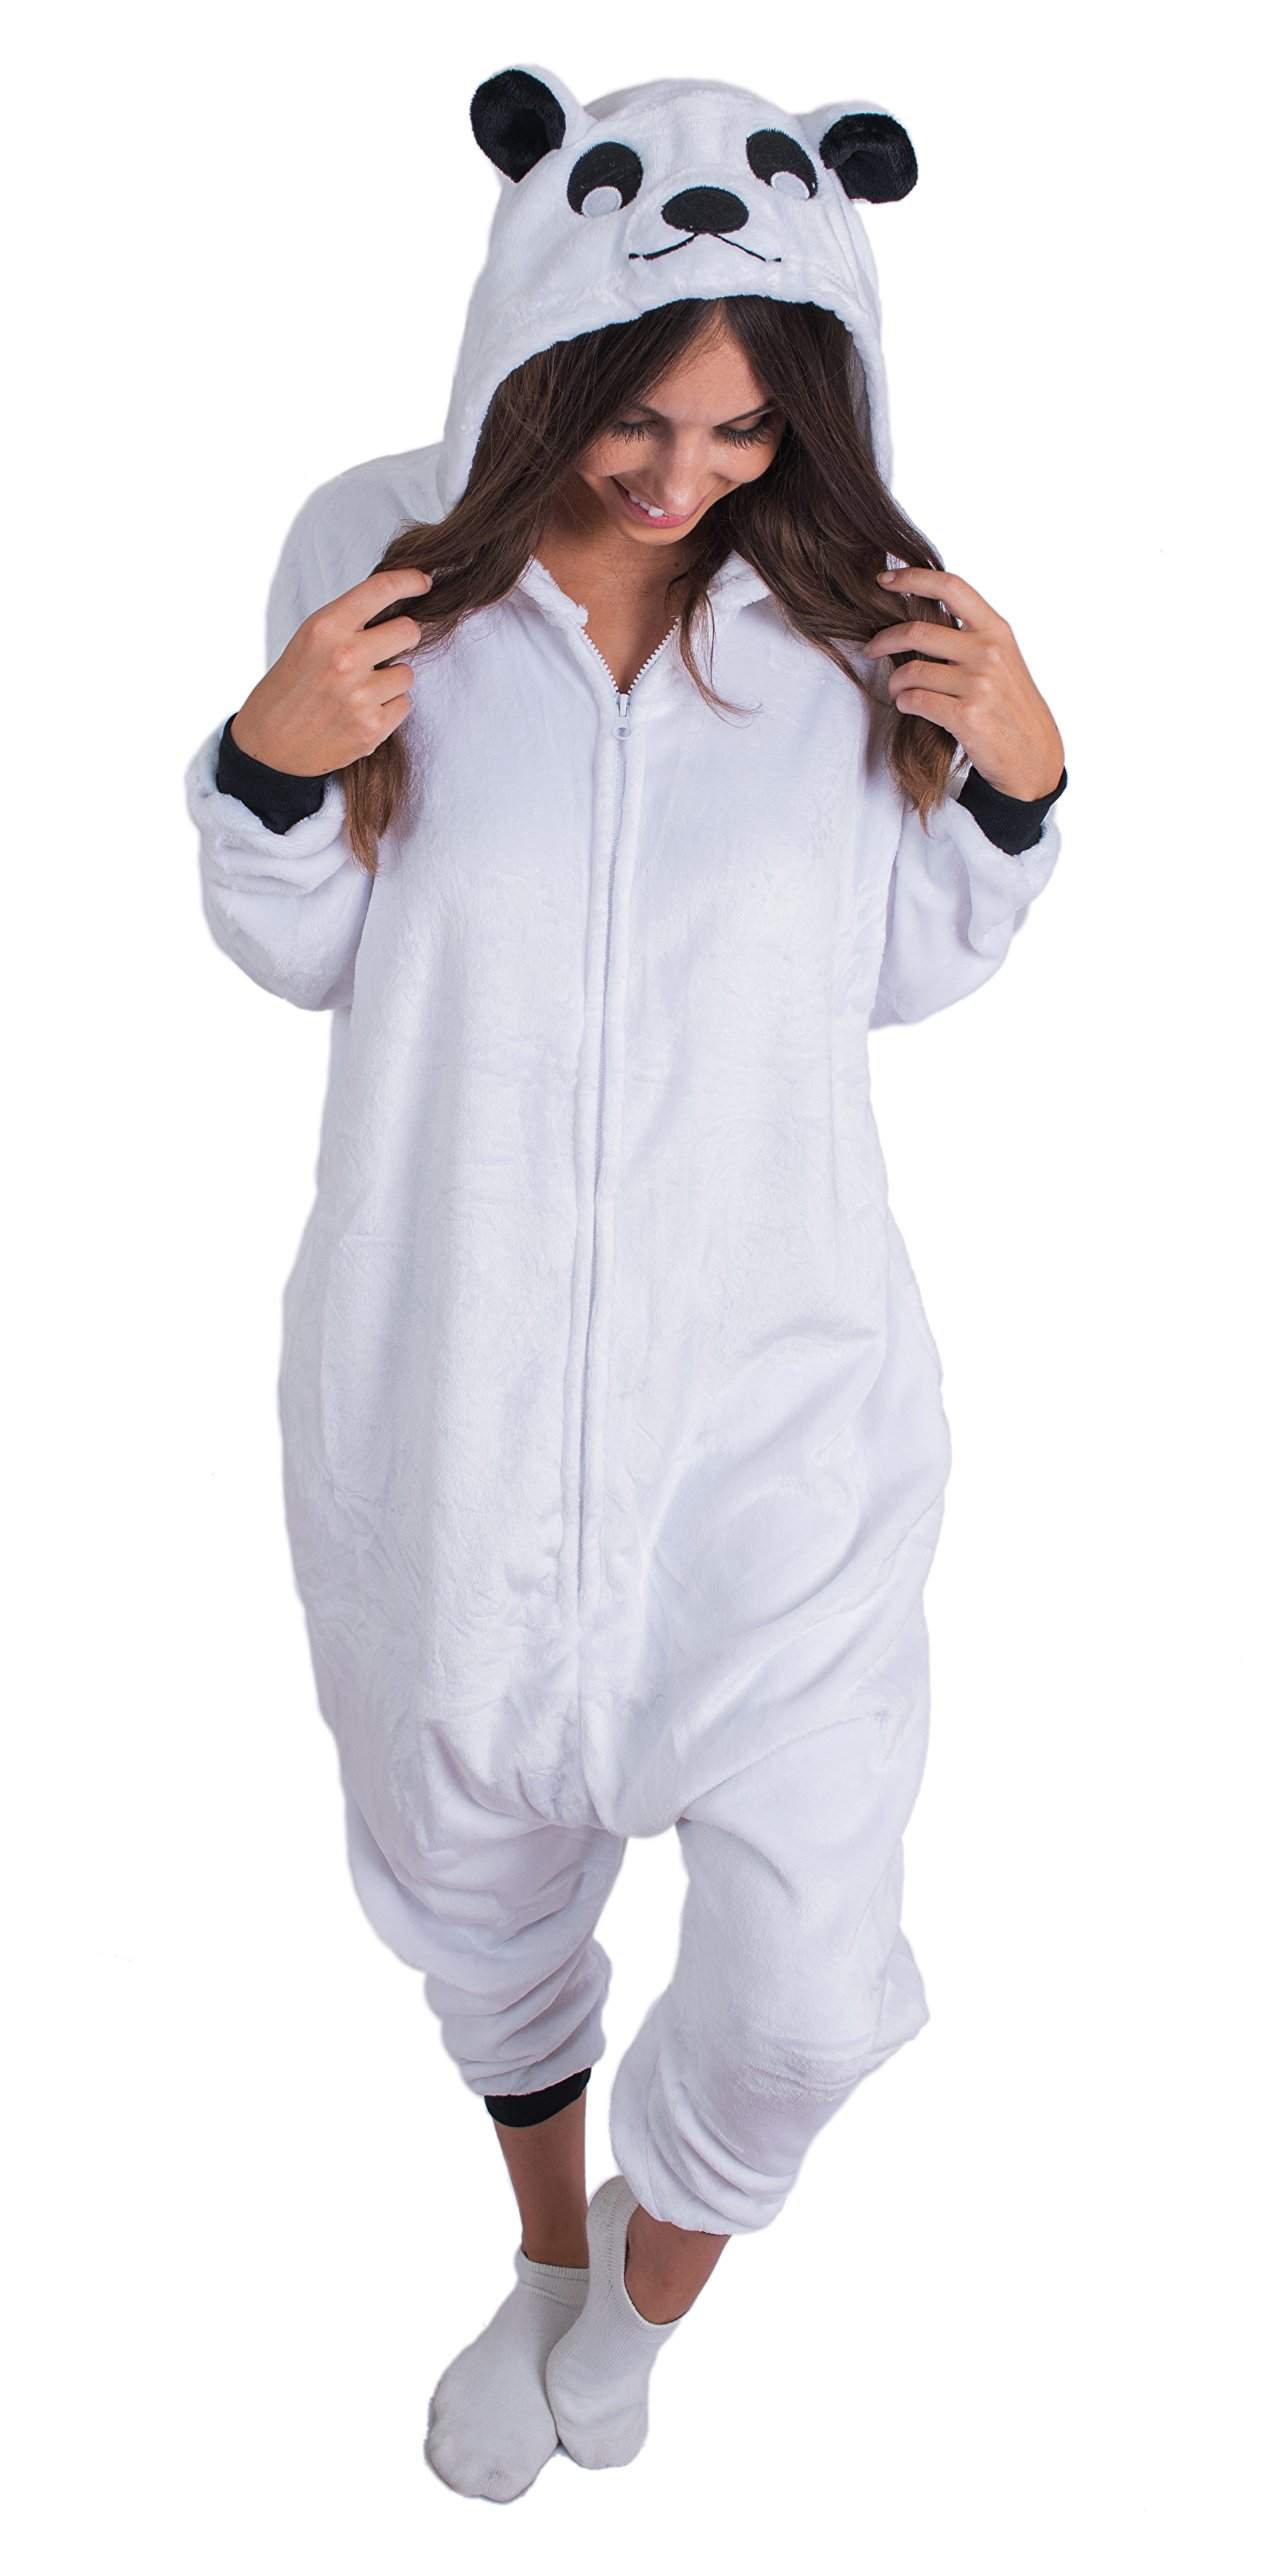 Adult Onesie Polar Bear Animal Pajamas Comfortable Costume With Zipper and Pockets (Small)